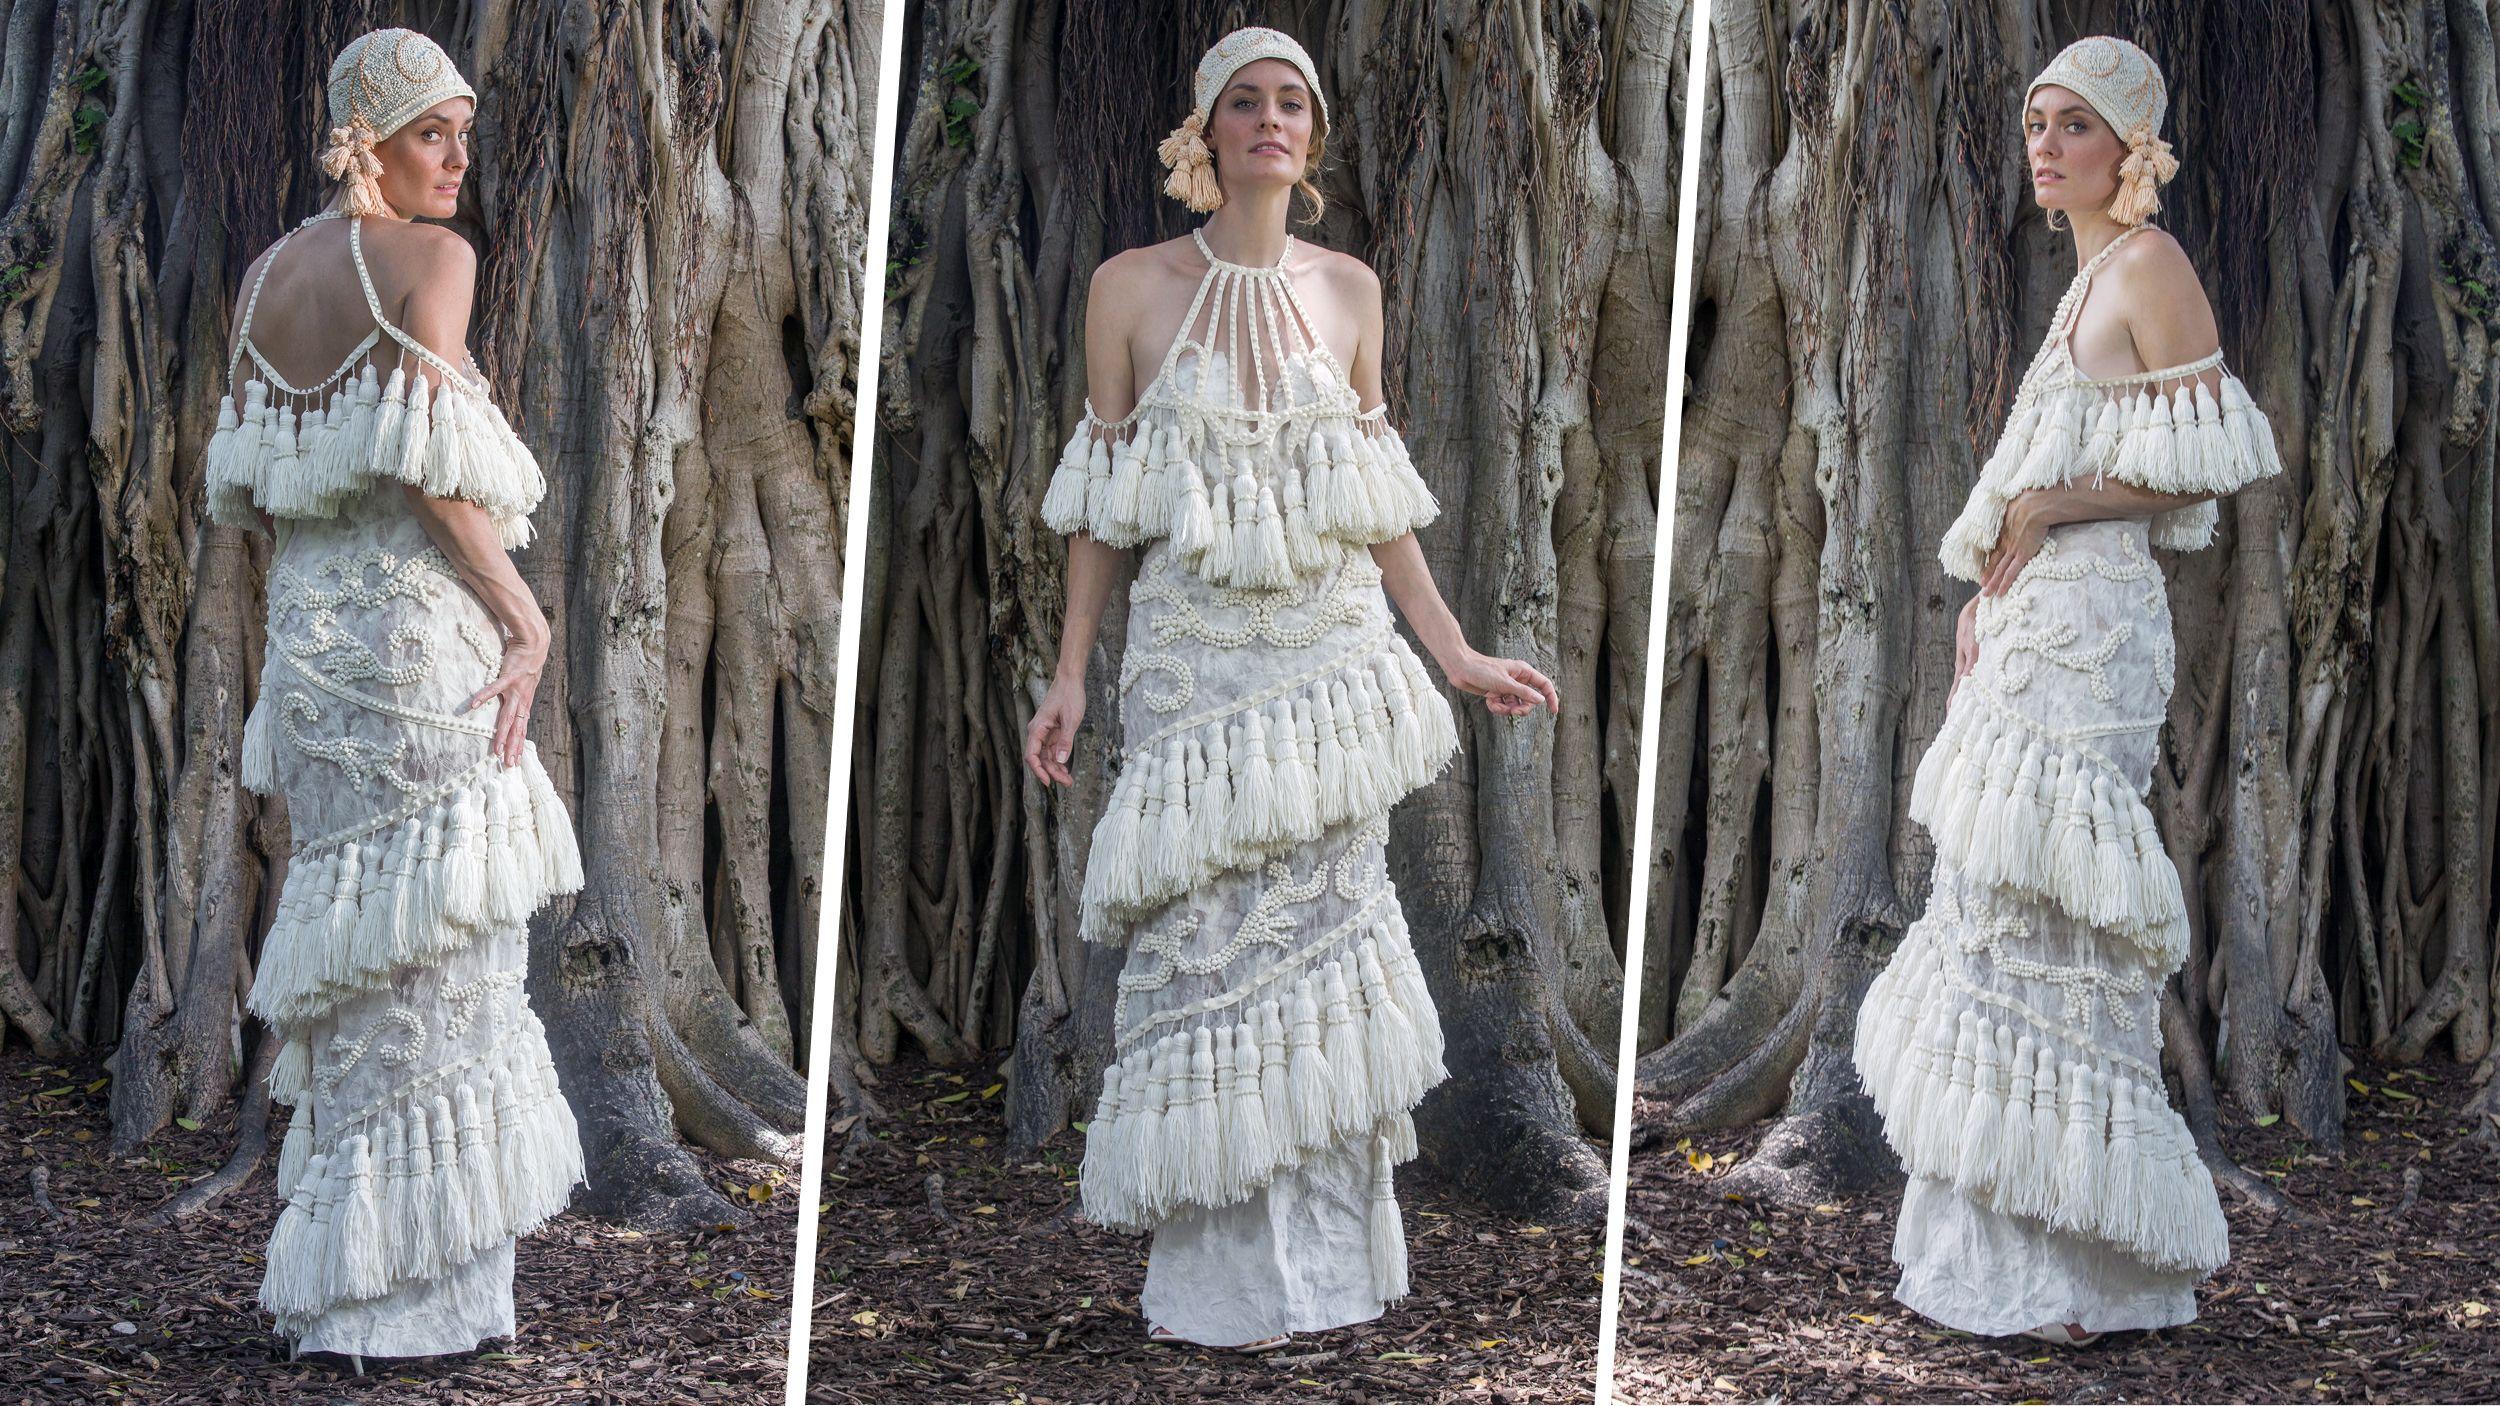 Pin by Virlonna Chavis on Fashion | Pinterest | Fashion